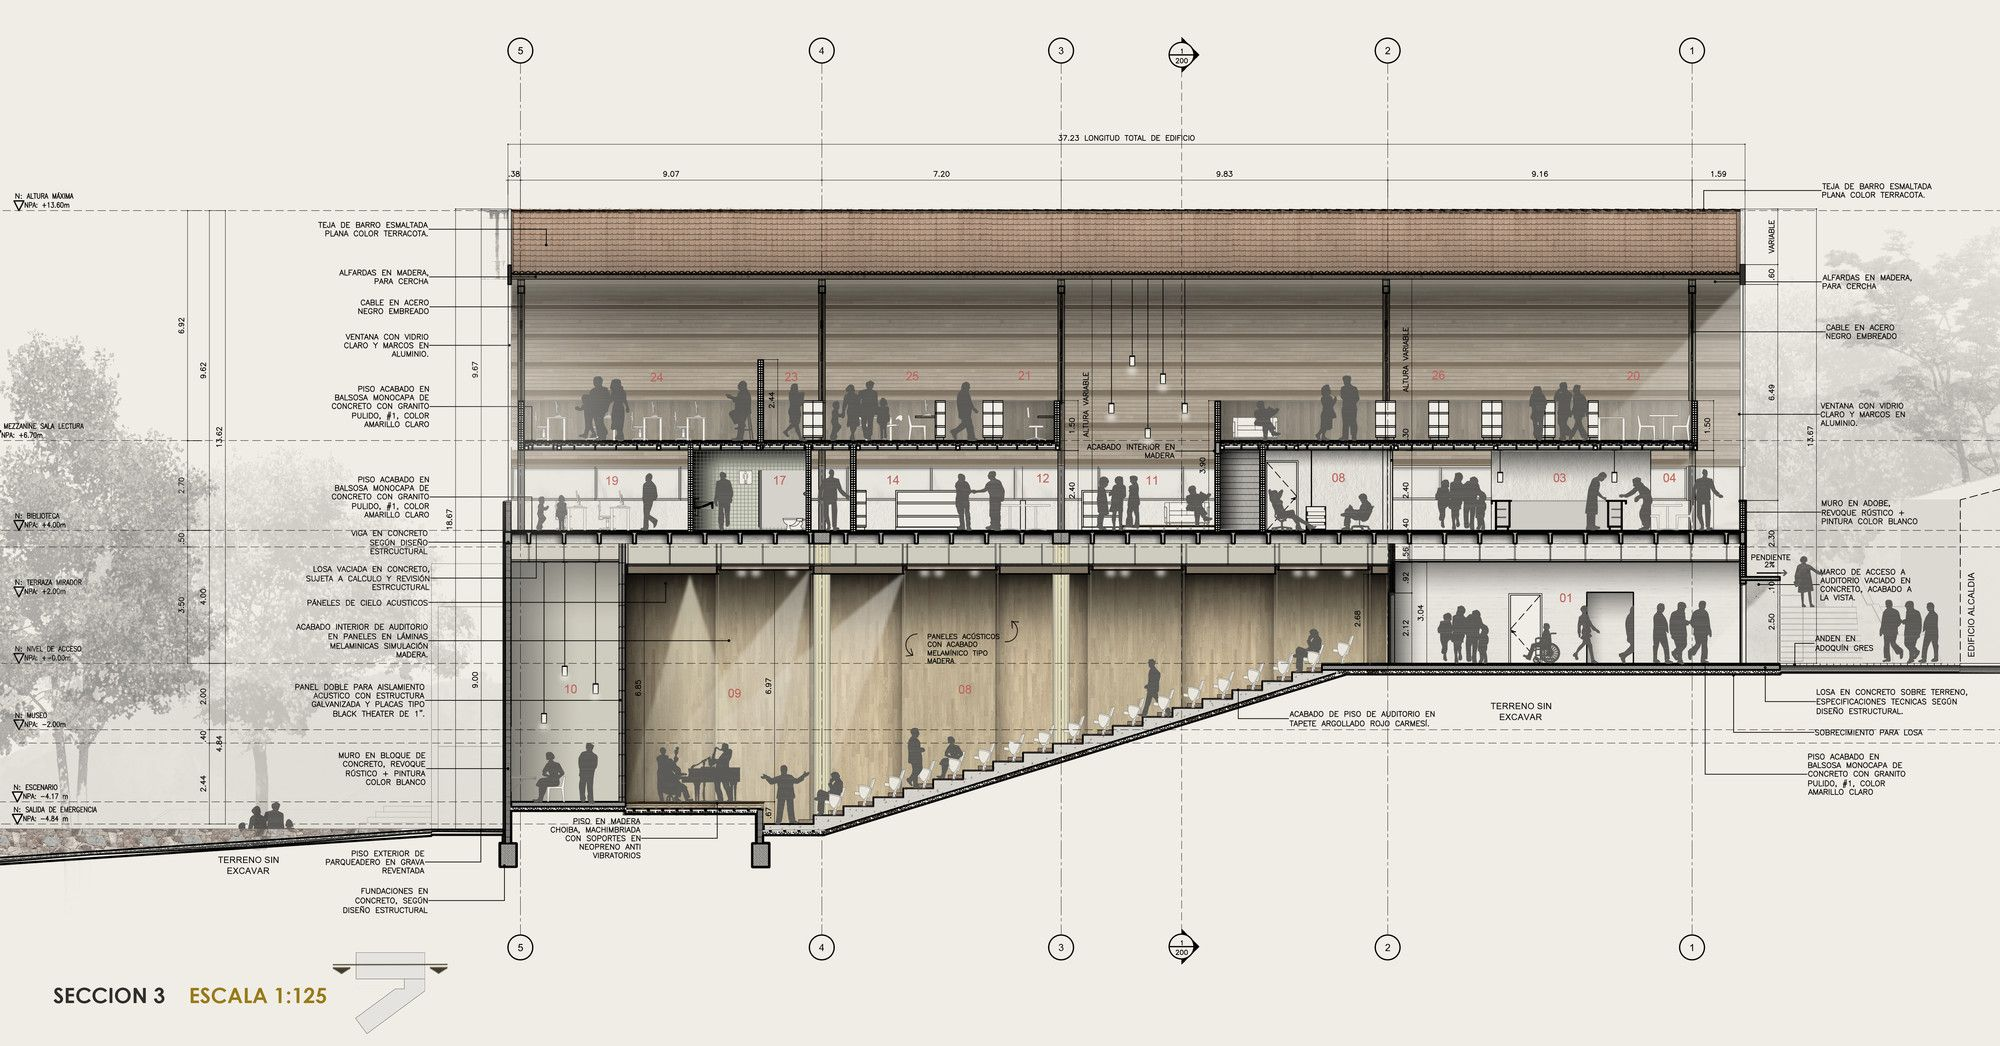 M s de 25 ideas incre bles sobre cortes arquitectonicos en for Dimensiones arquitectonicas